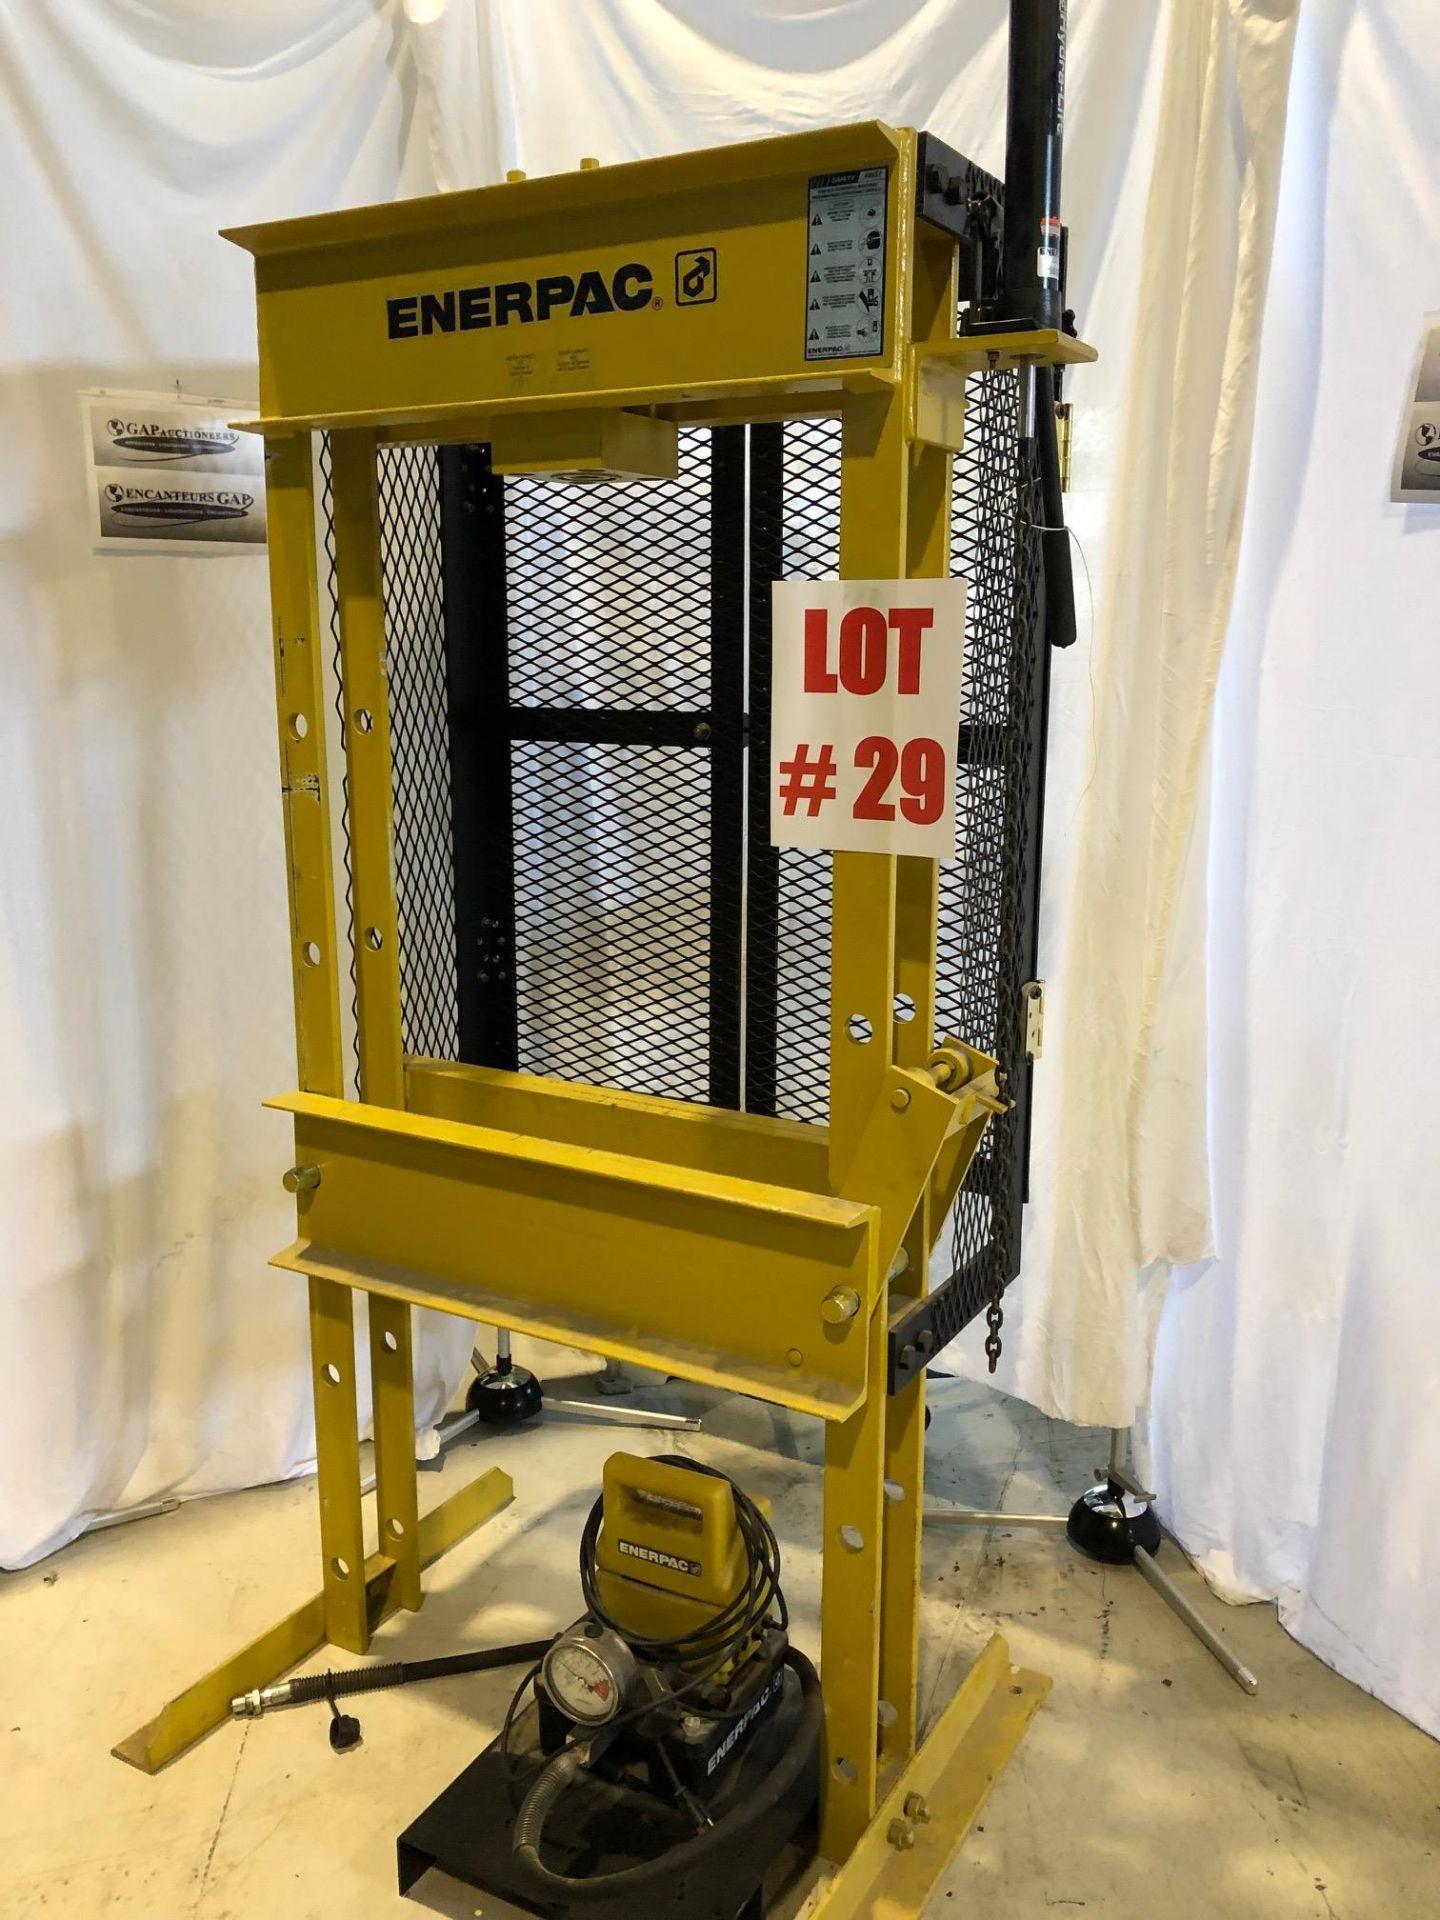 ENERPAC SHOP PRESS, MODEL C215900, S/N E119C, 15 TON - LOCATION, MONTREAL, QUEBEC - Image 2 of 5